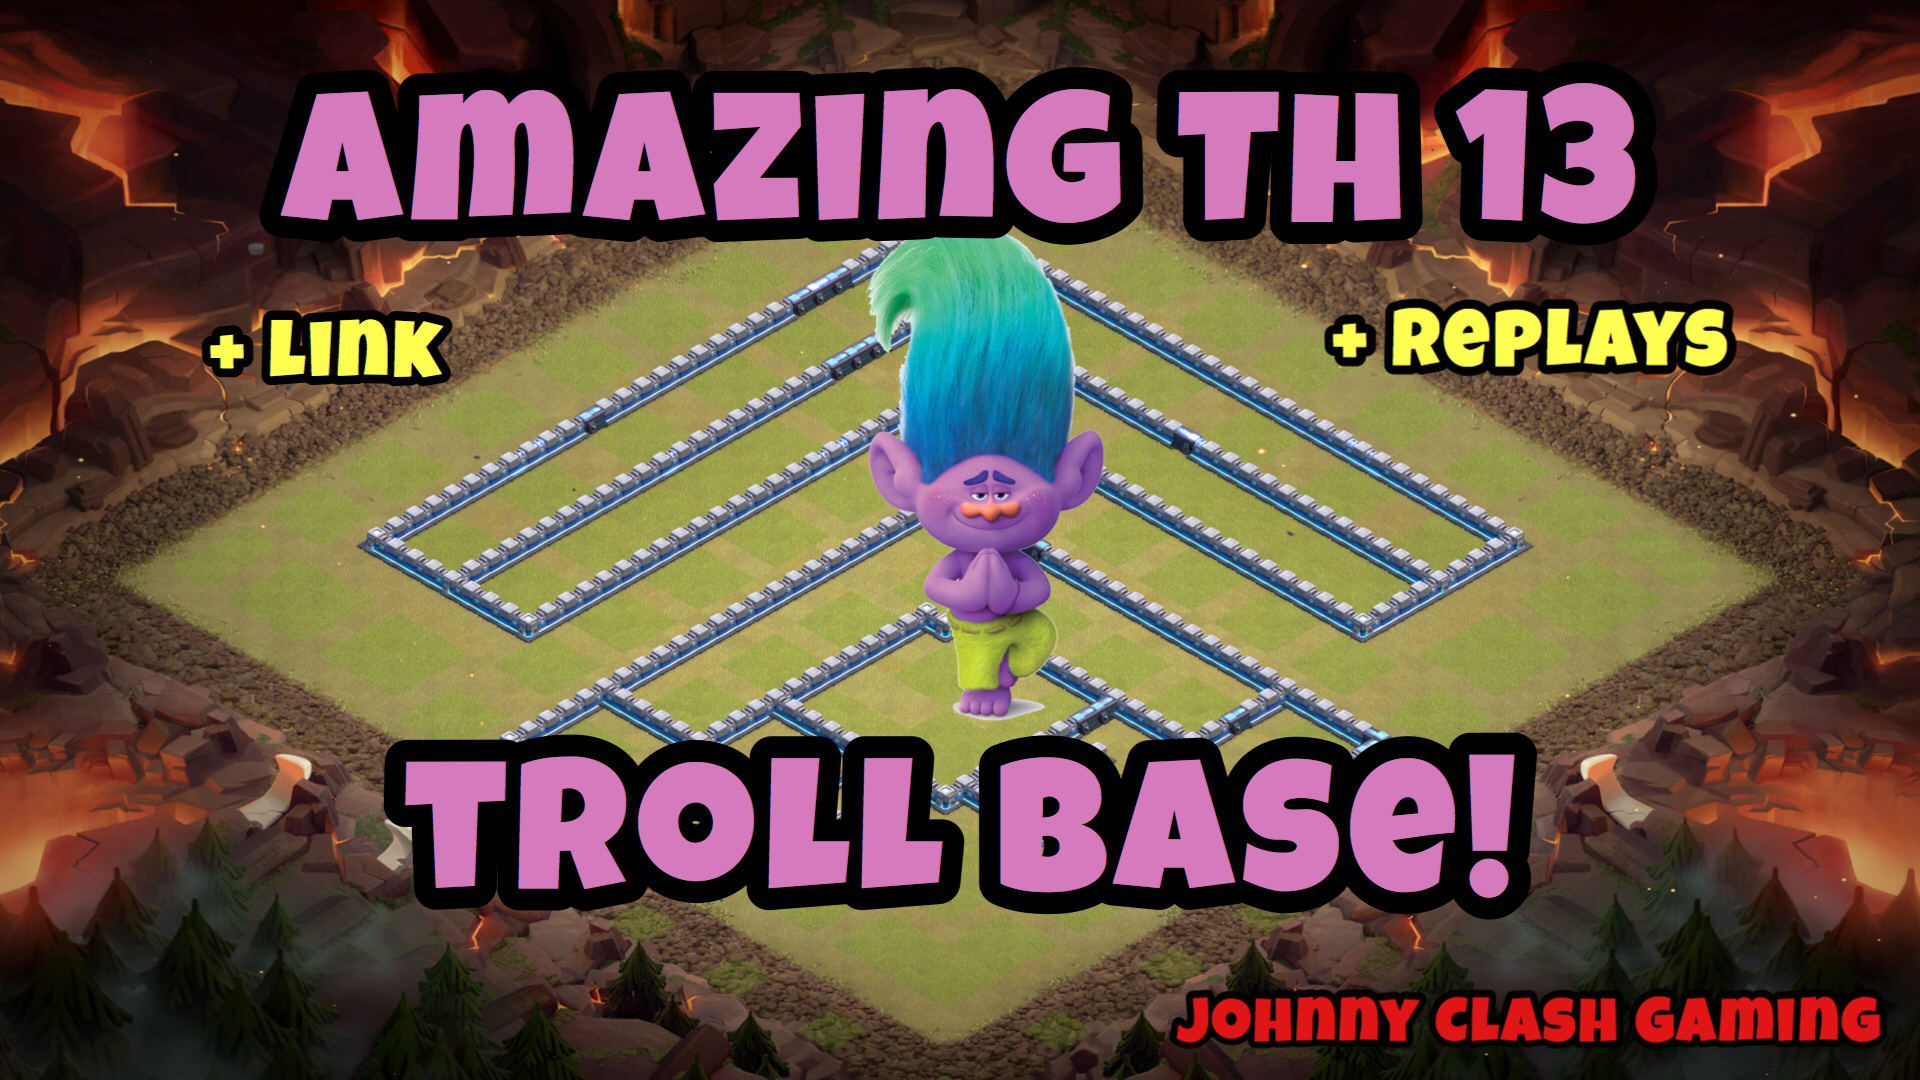 Nova Base Th 13 Troll Legends Estrela Anti 3 Johnny Clash